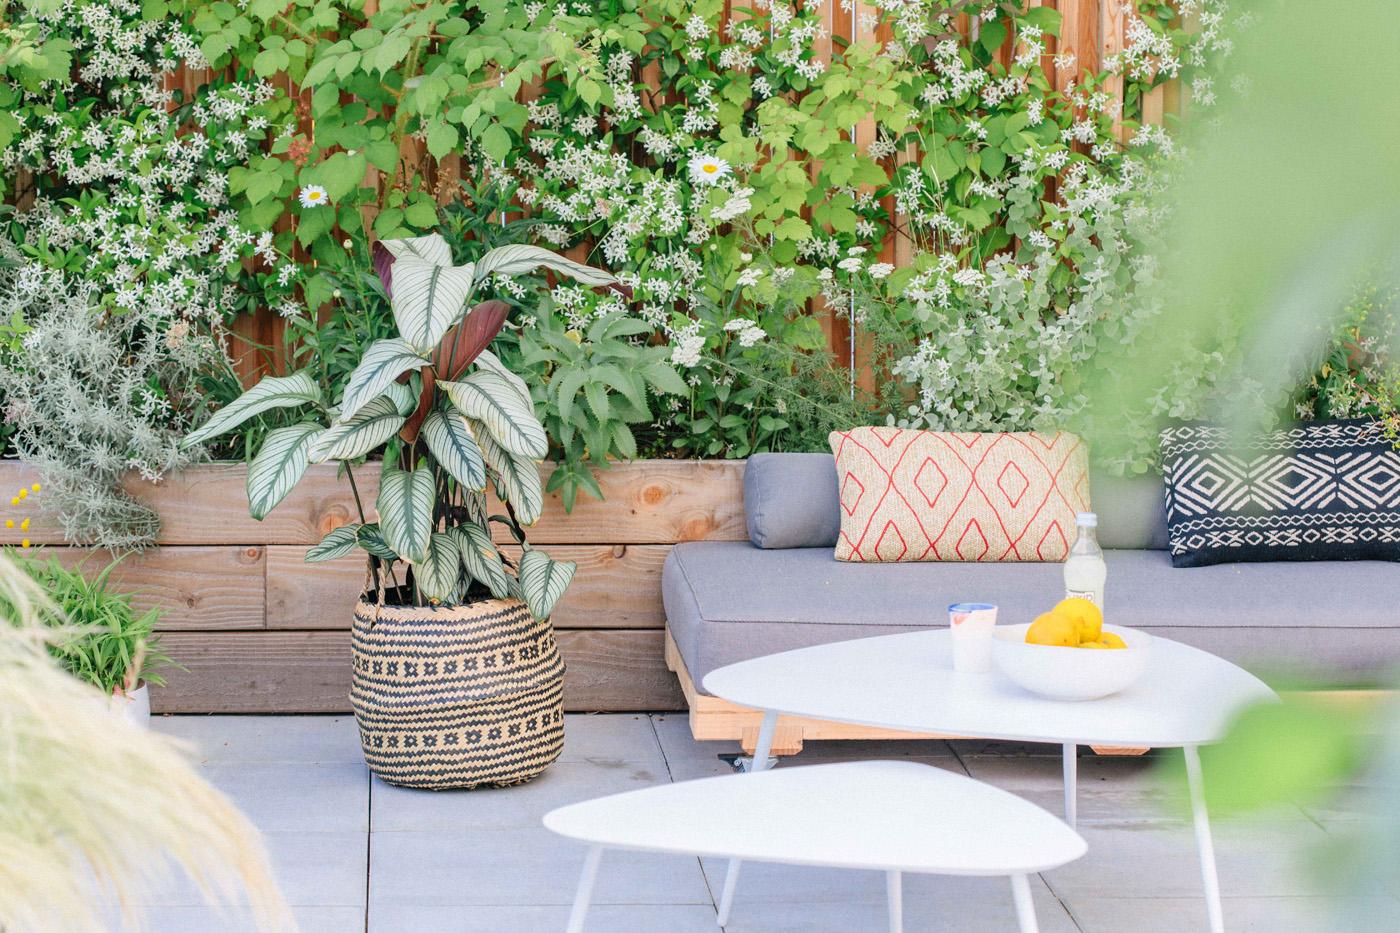 61-Lili Garden Terrasse Romainville Details